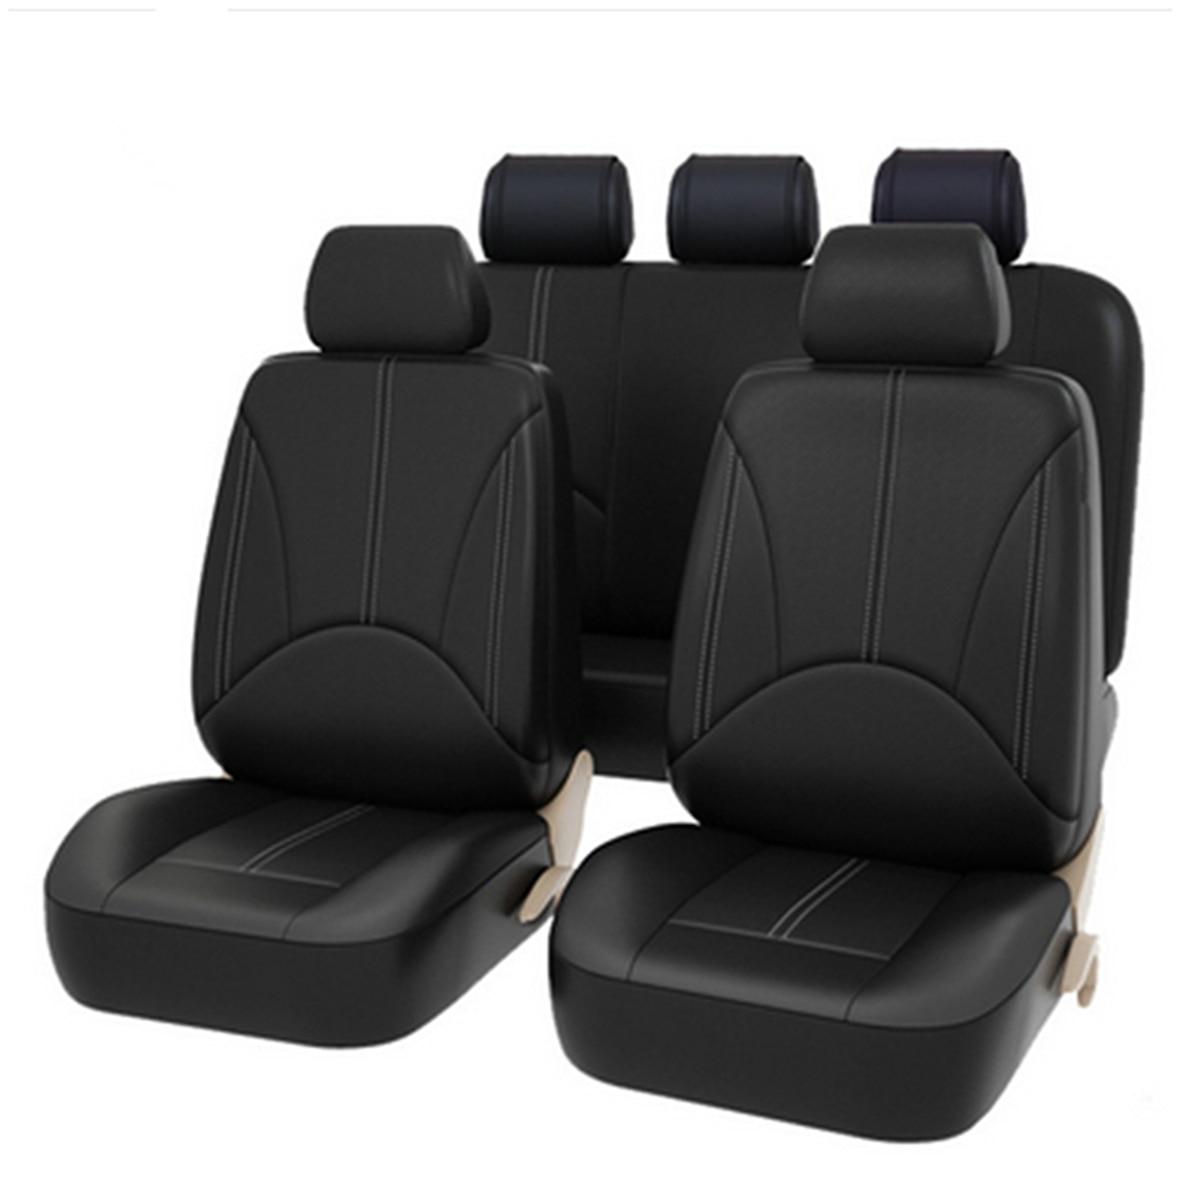 Car seat covers fit Skoda Rapid full set Leatherette black